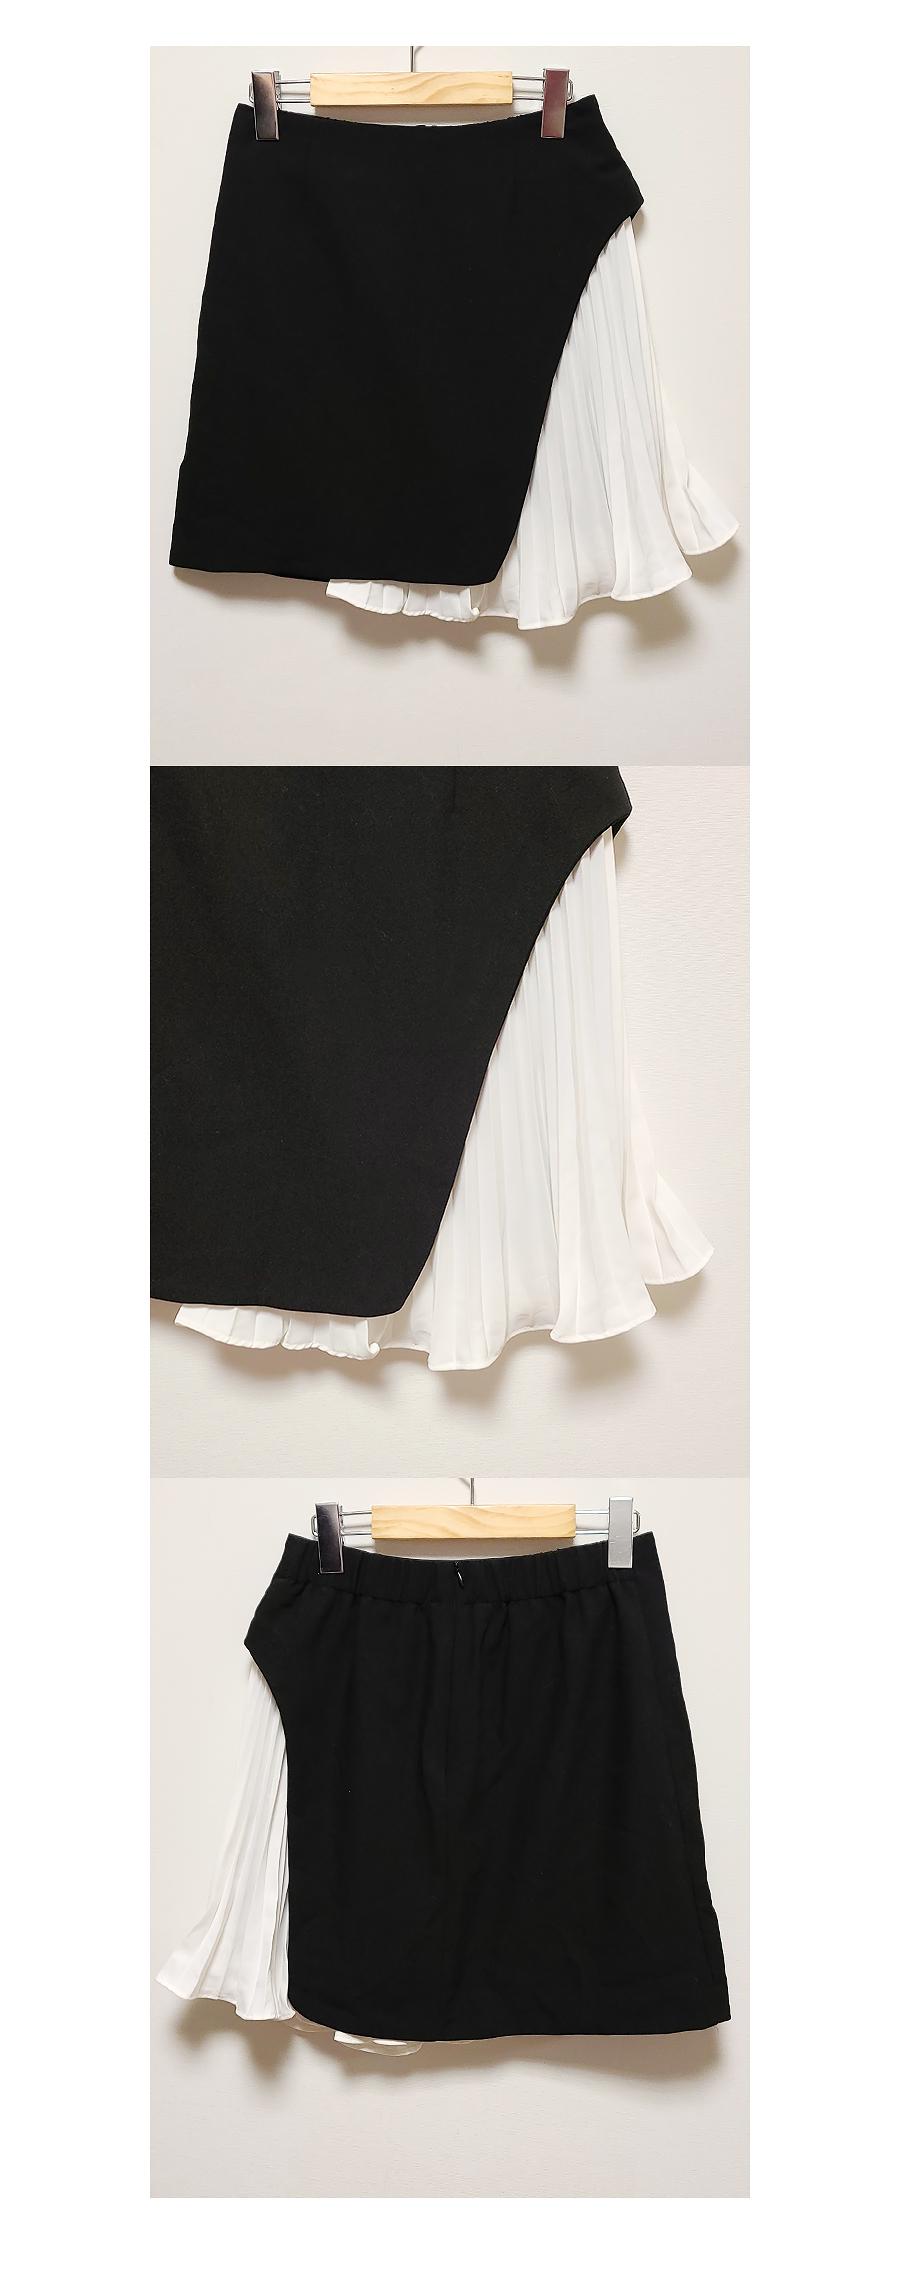 Natalie color pleated skirt